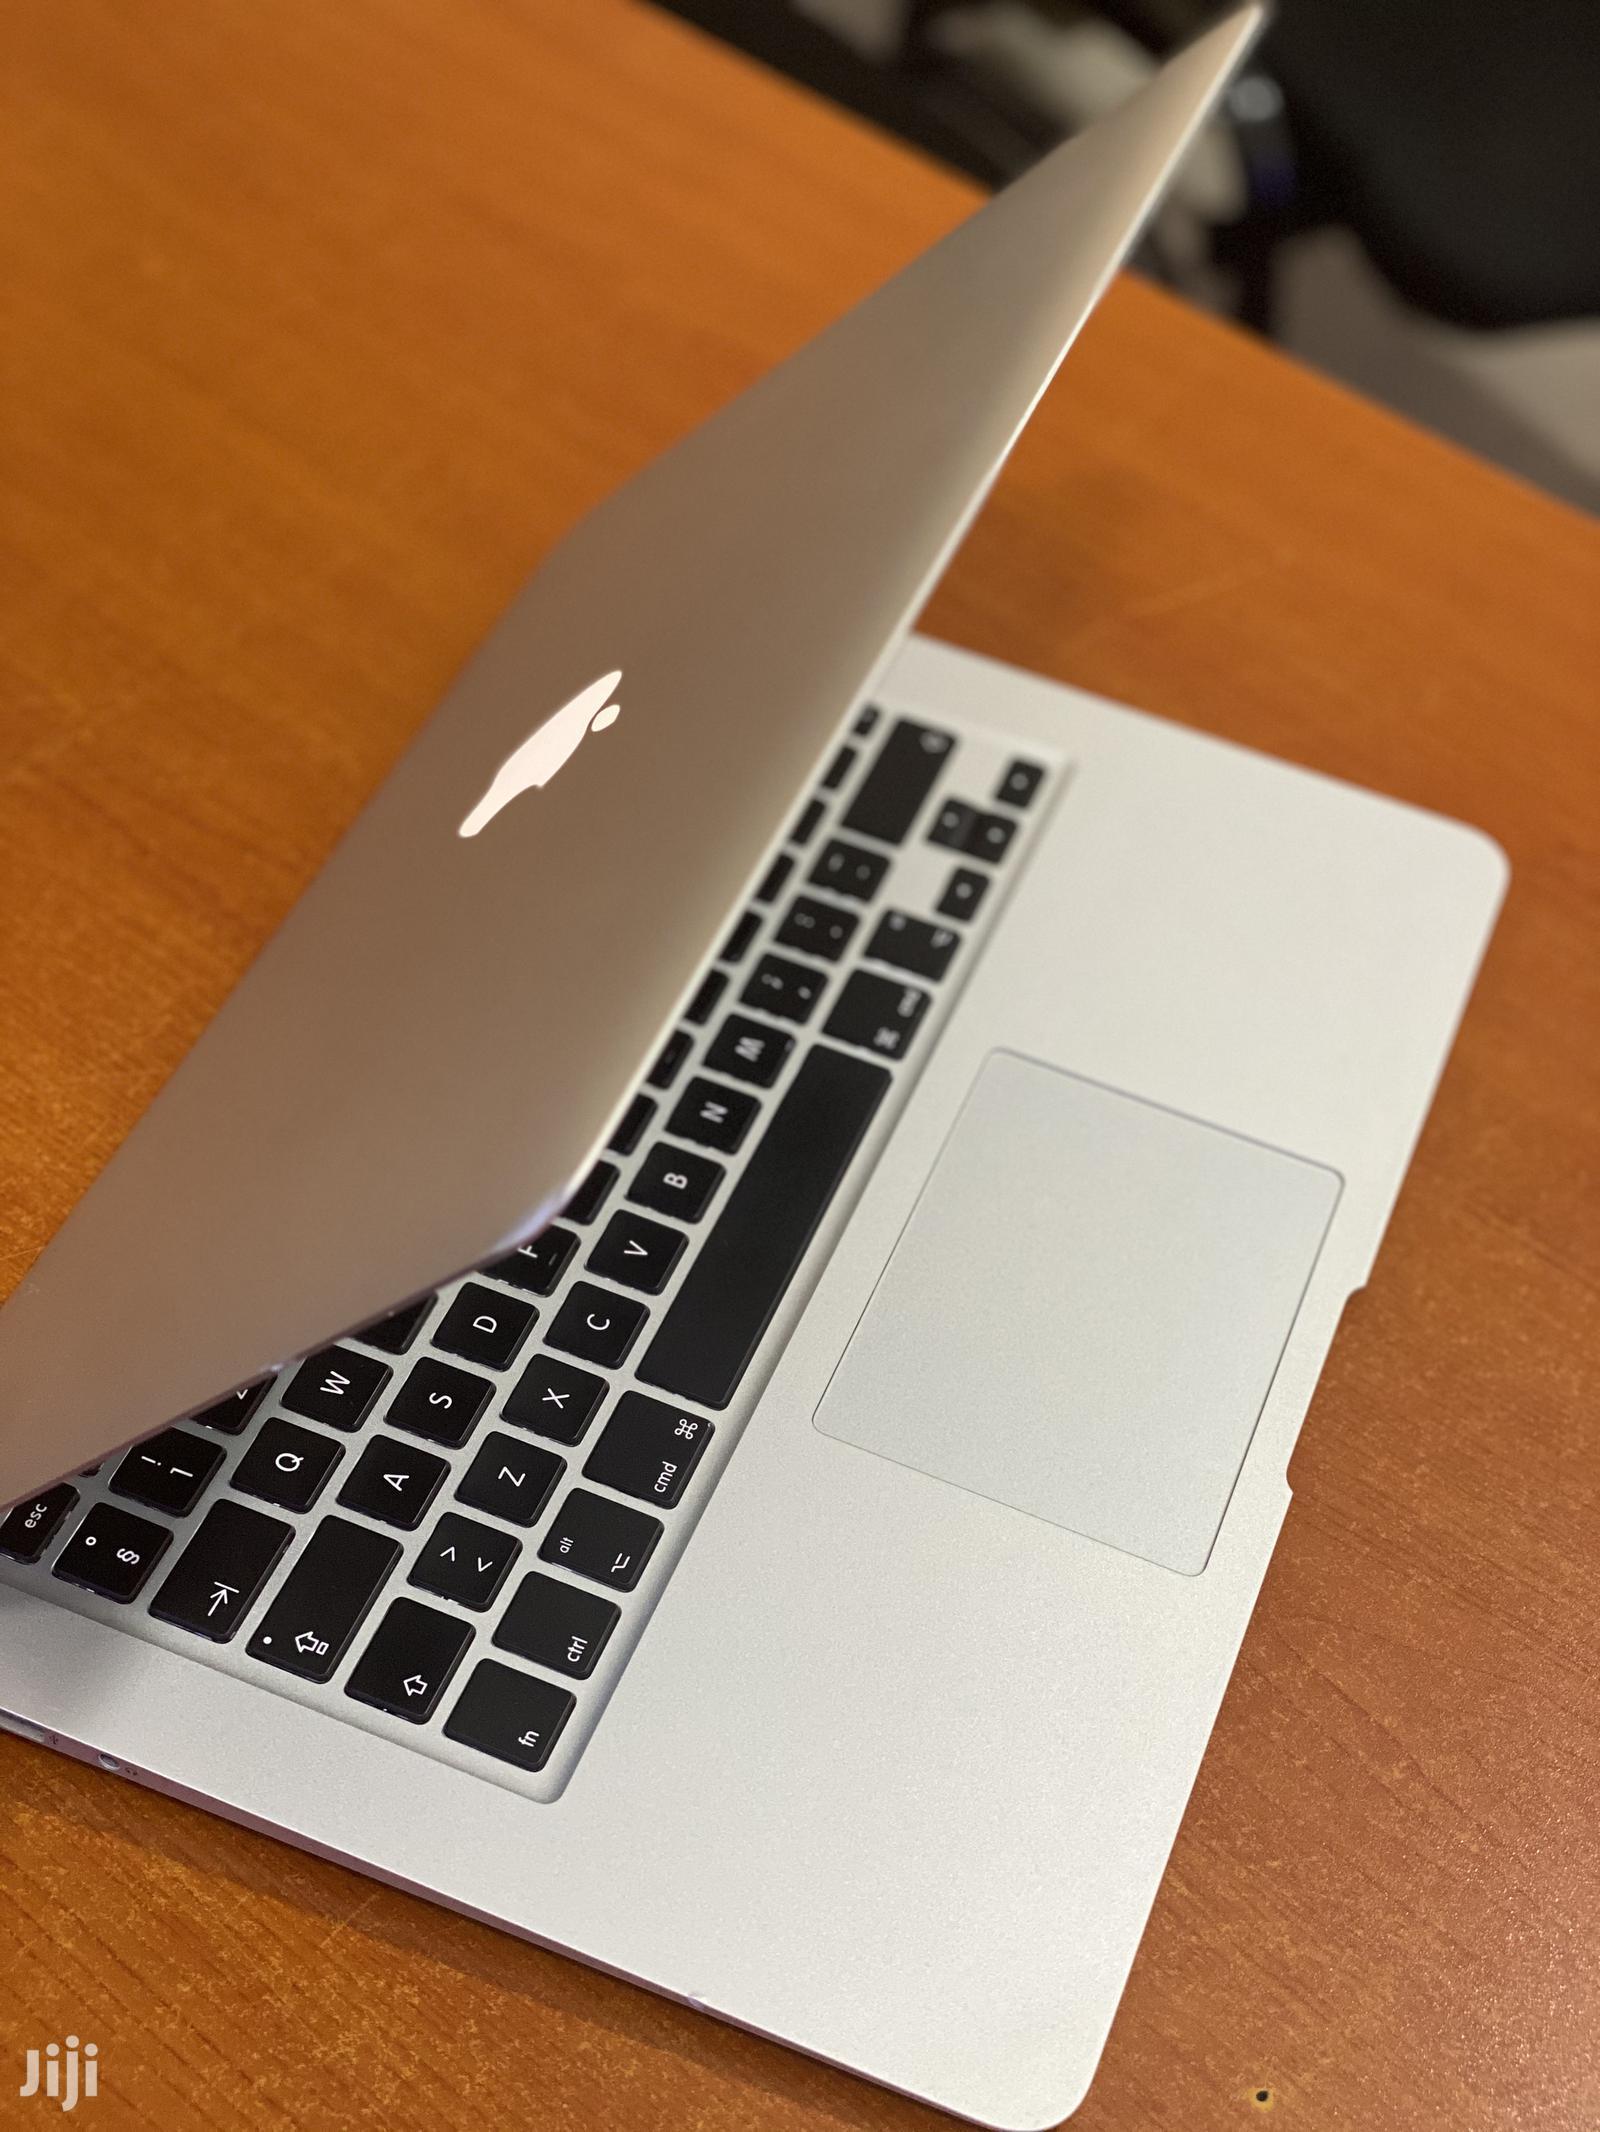 New Laptop Apple MacBook Air 8GB Intel Core i5 SSHD (Hybrid) 128GB | Laptops & Computers for sale in Kampala, Central Region, Uganda